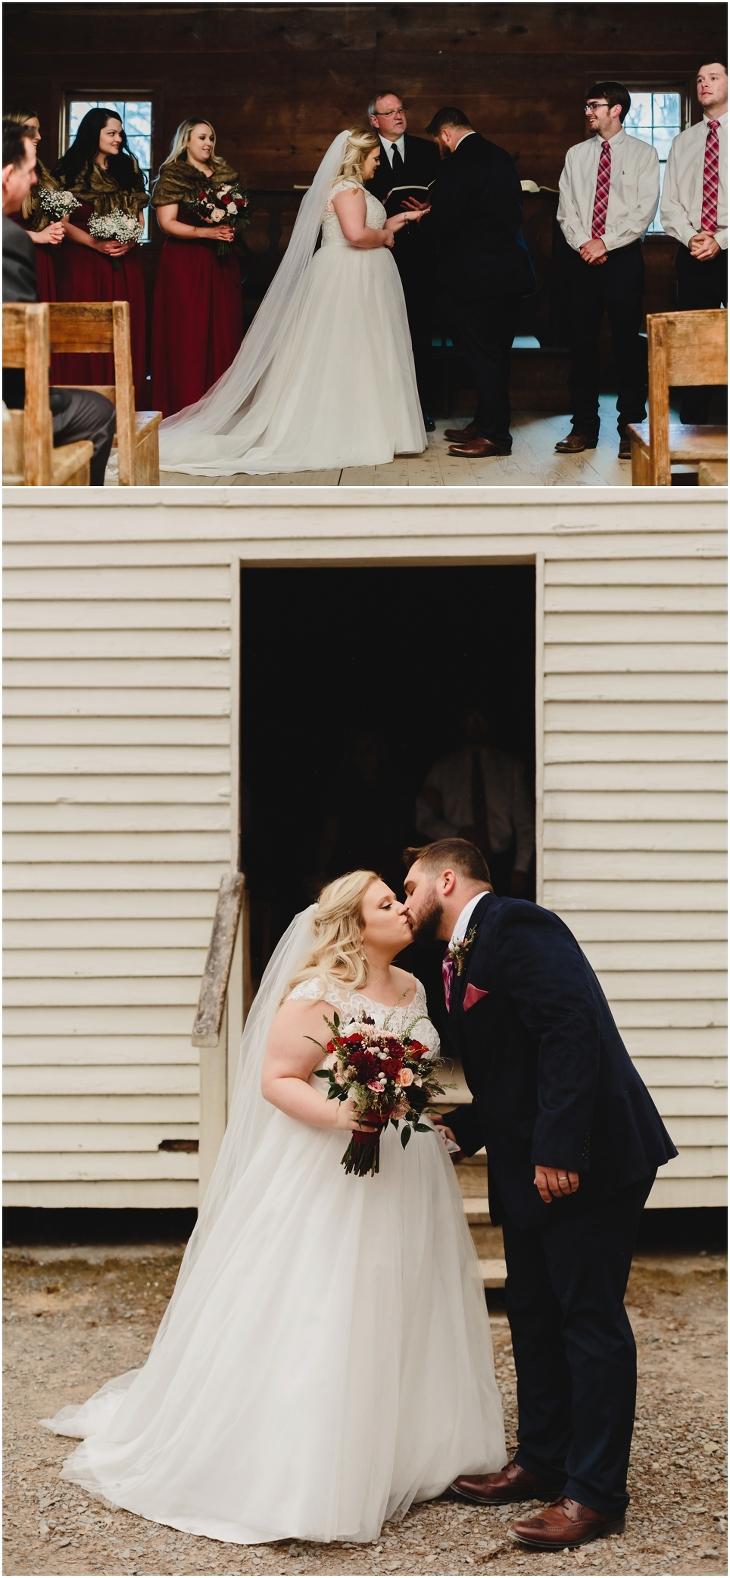 cades cove baptist church wedding